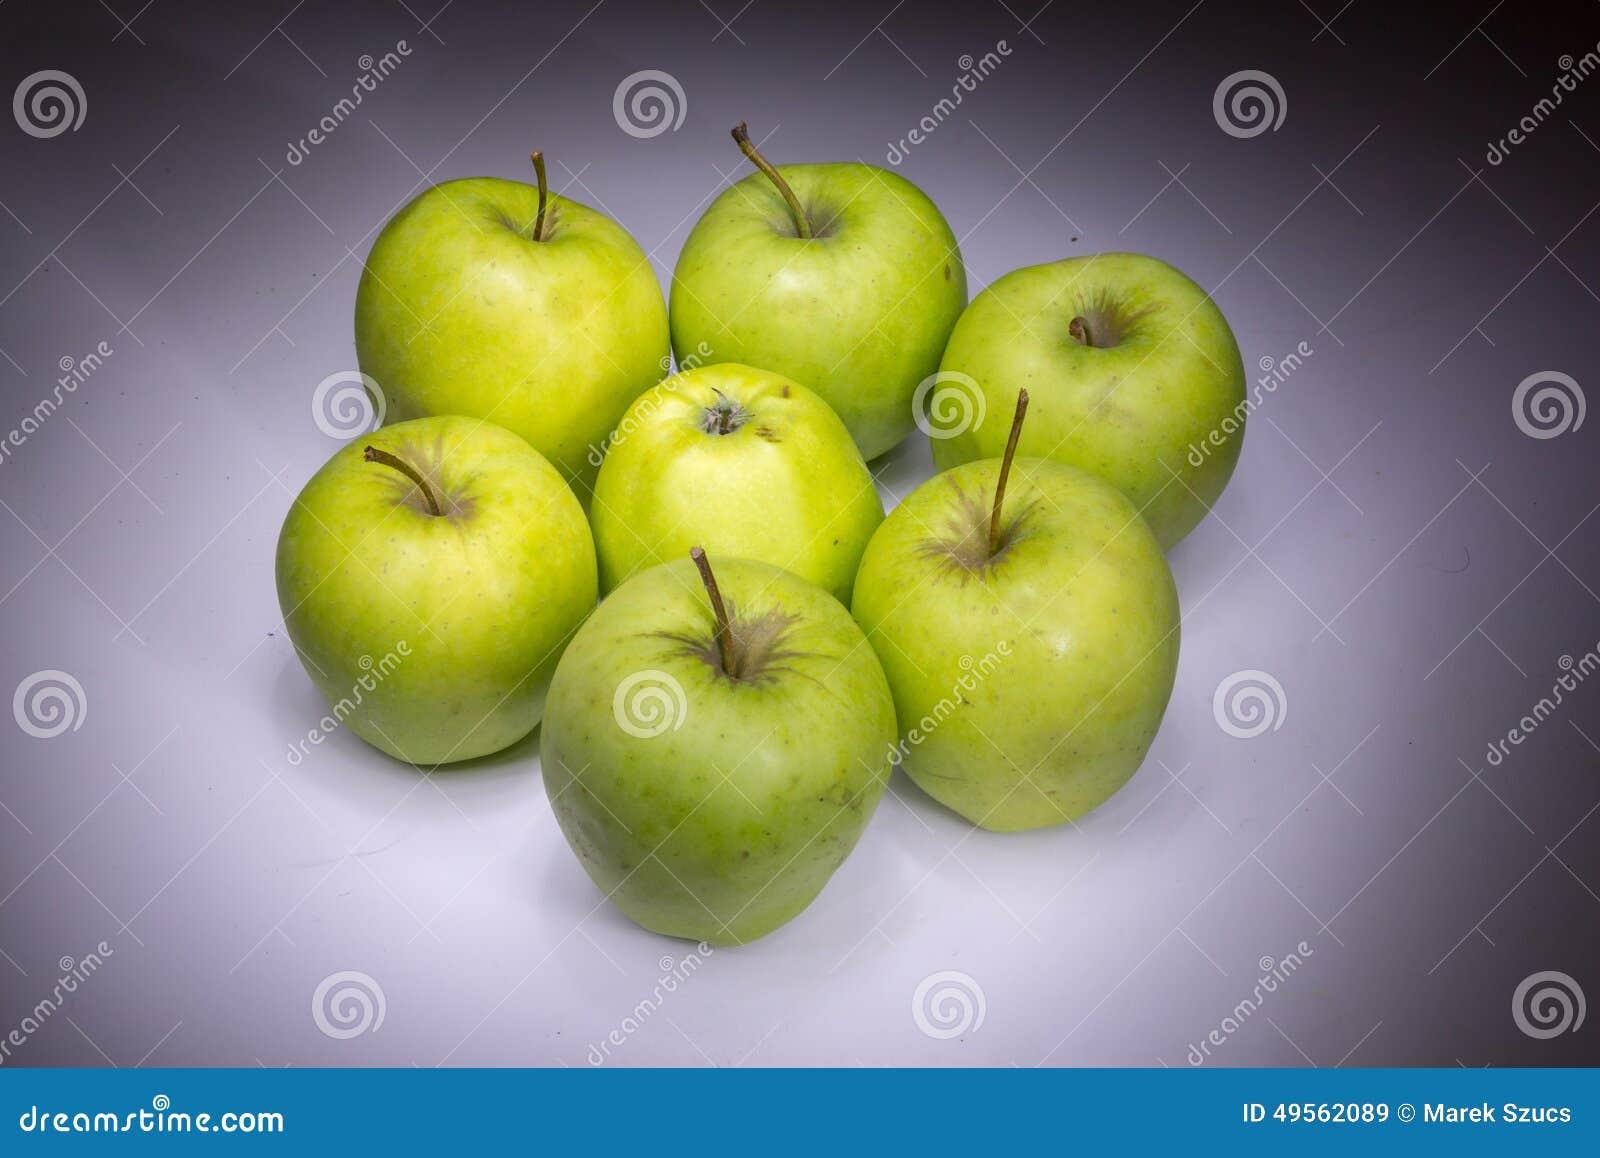 Lucky seven green apples